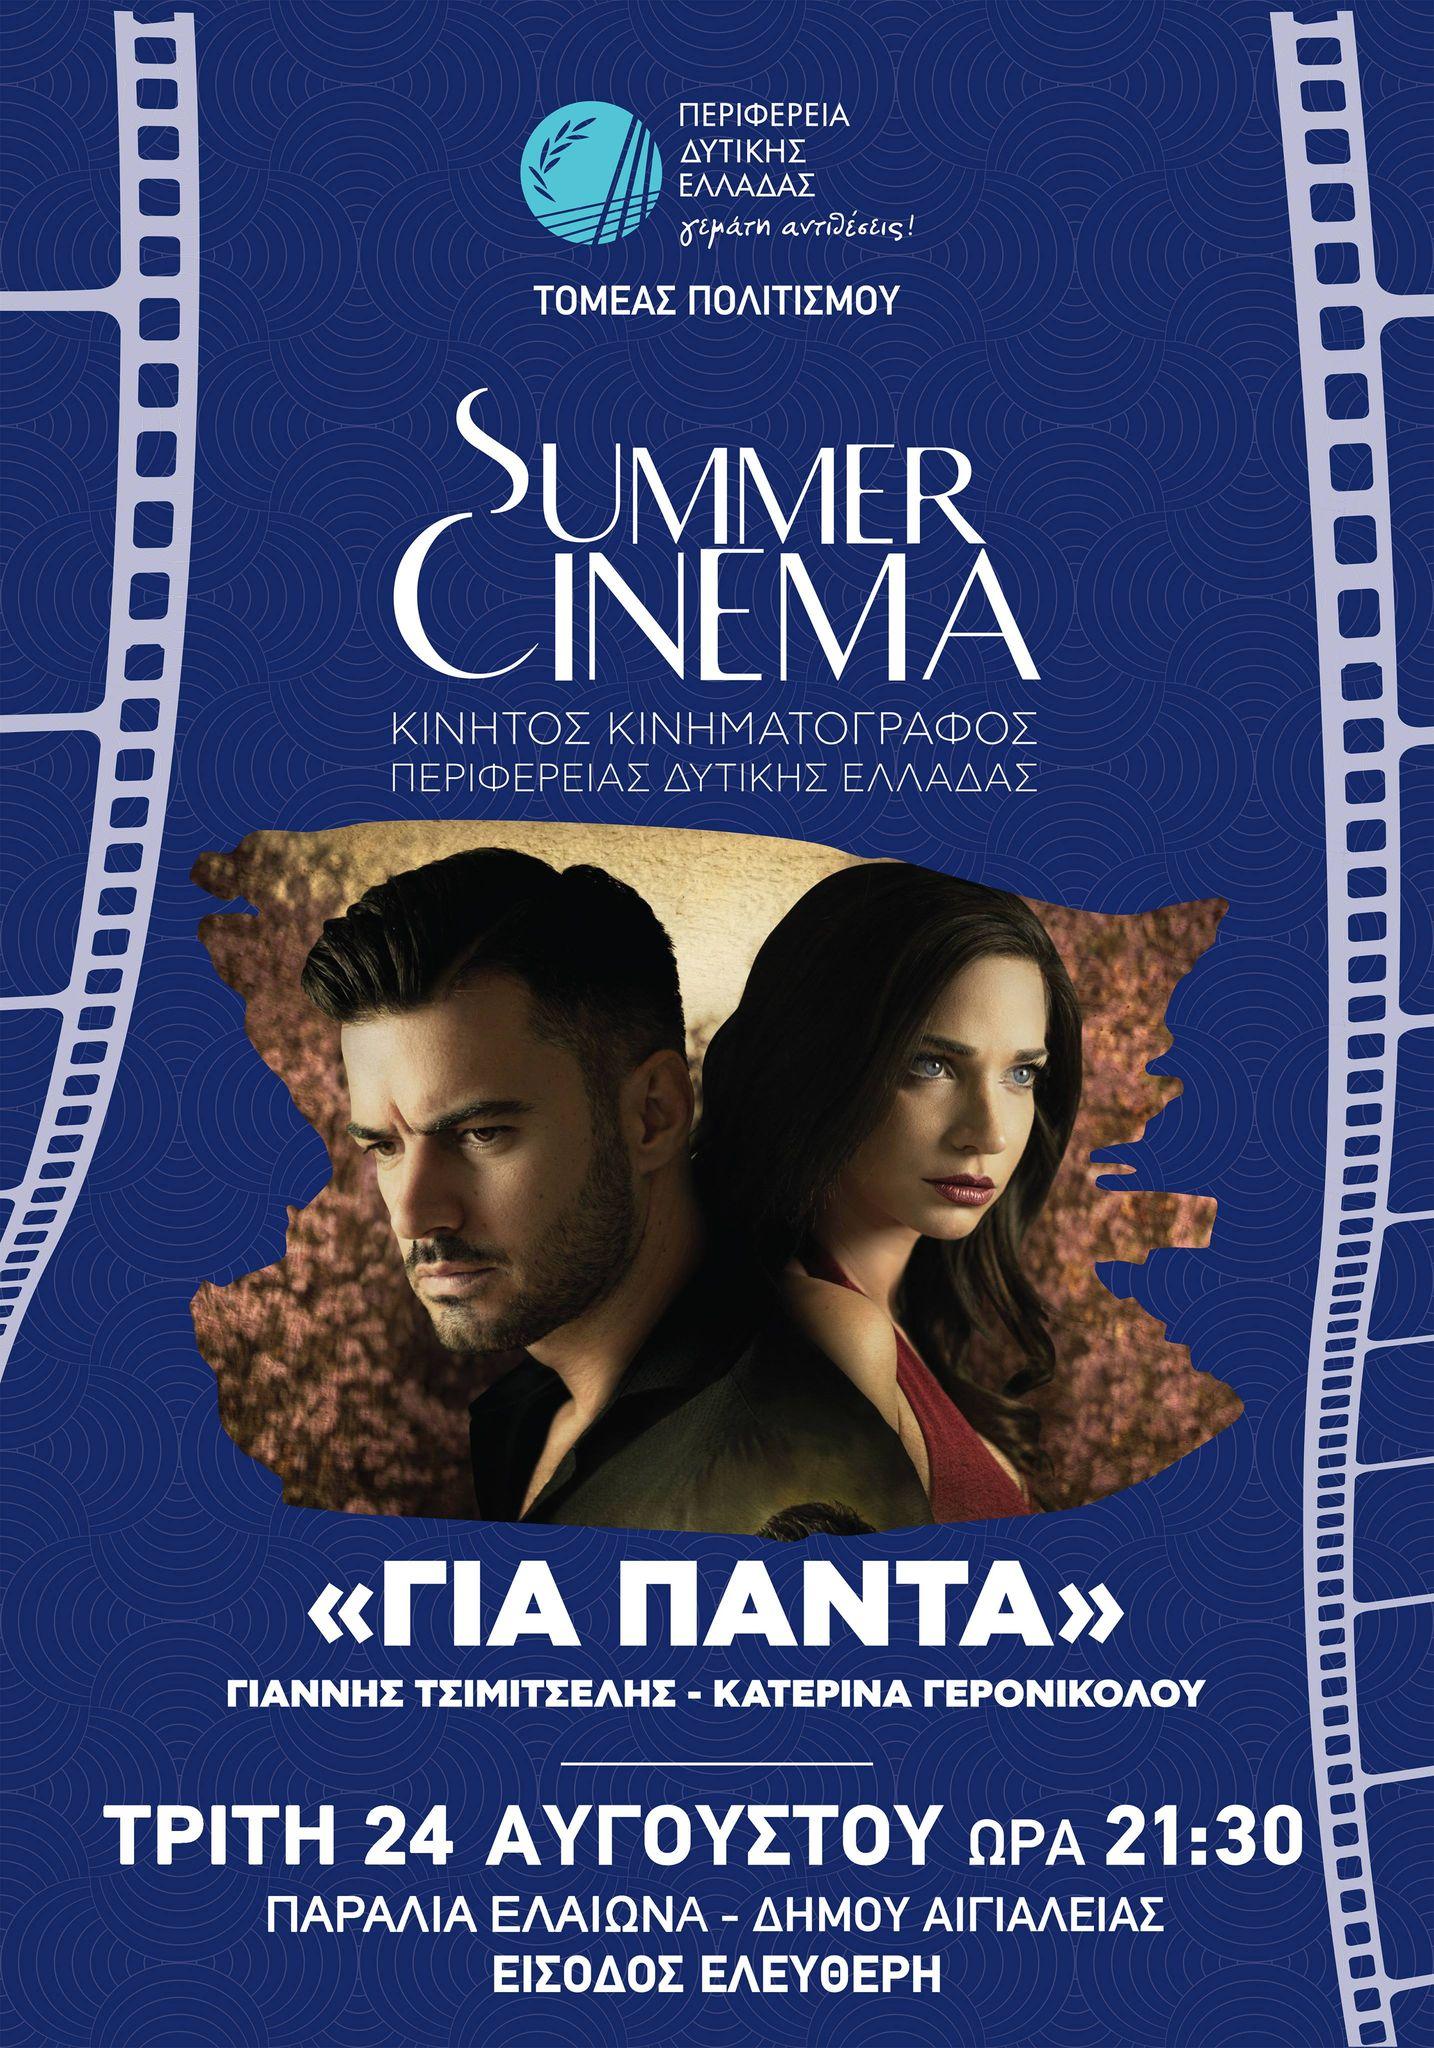 SUMMER CINEMA PARALIA ELAIONA